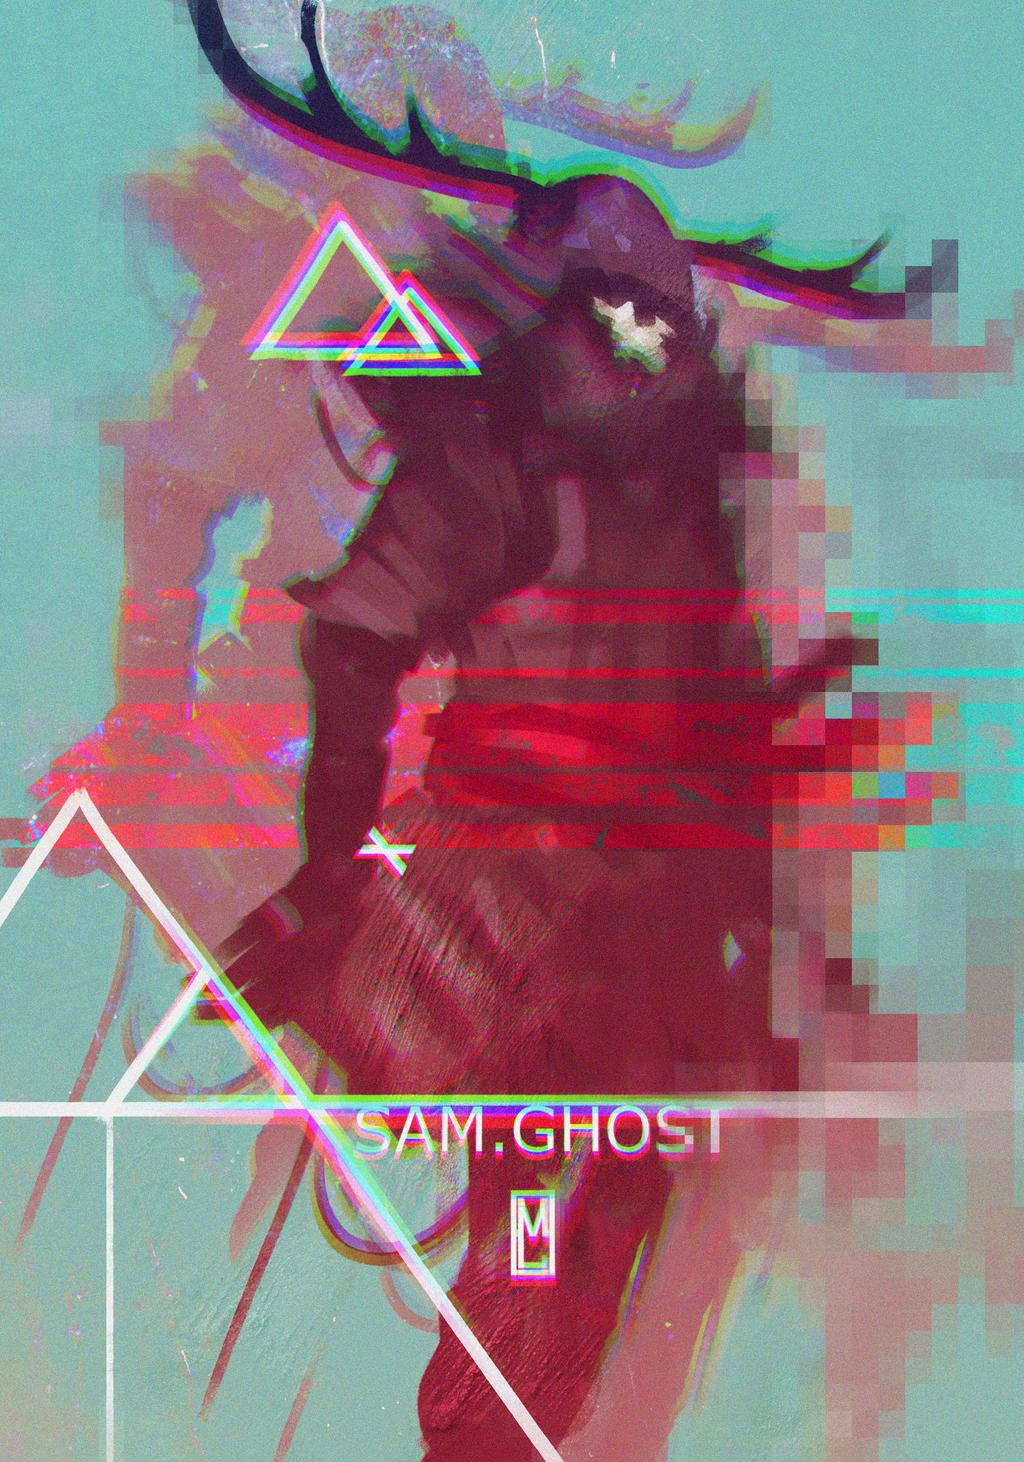 Samurai Ghost by Marcodalidingo